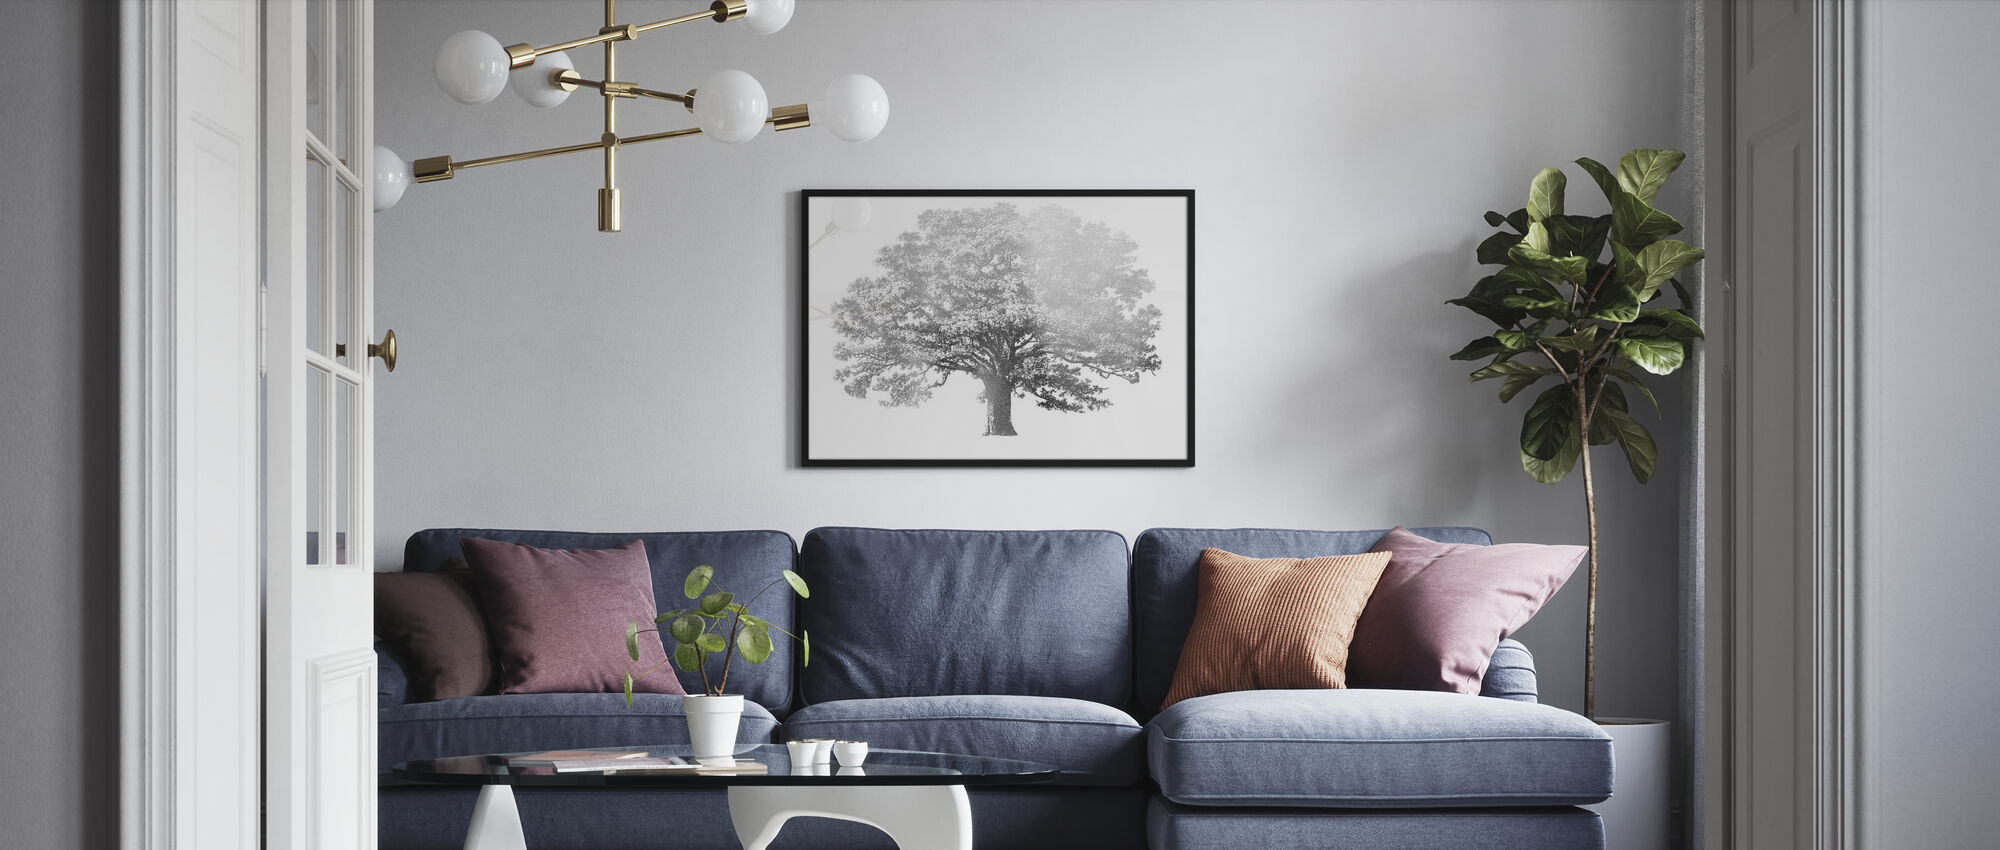 Elephant Tree - Framed print - Living Room